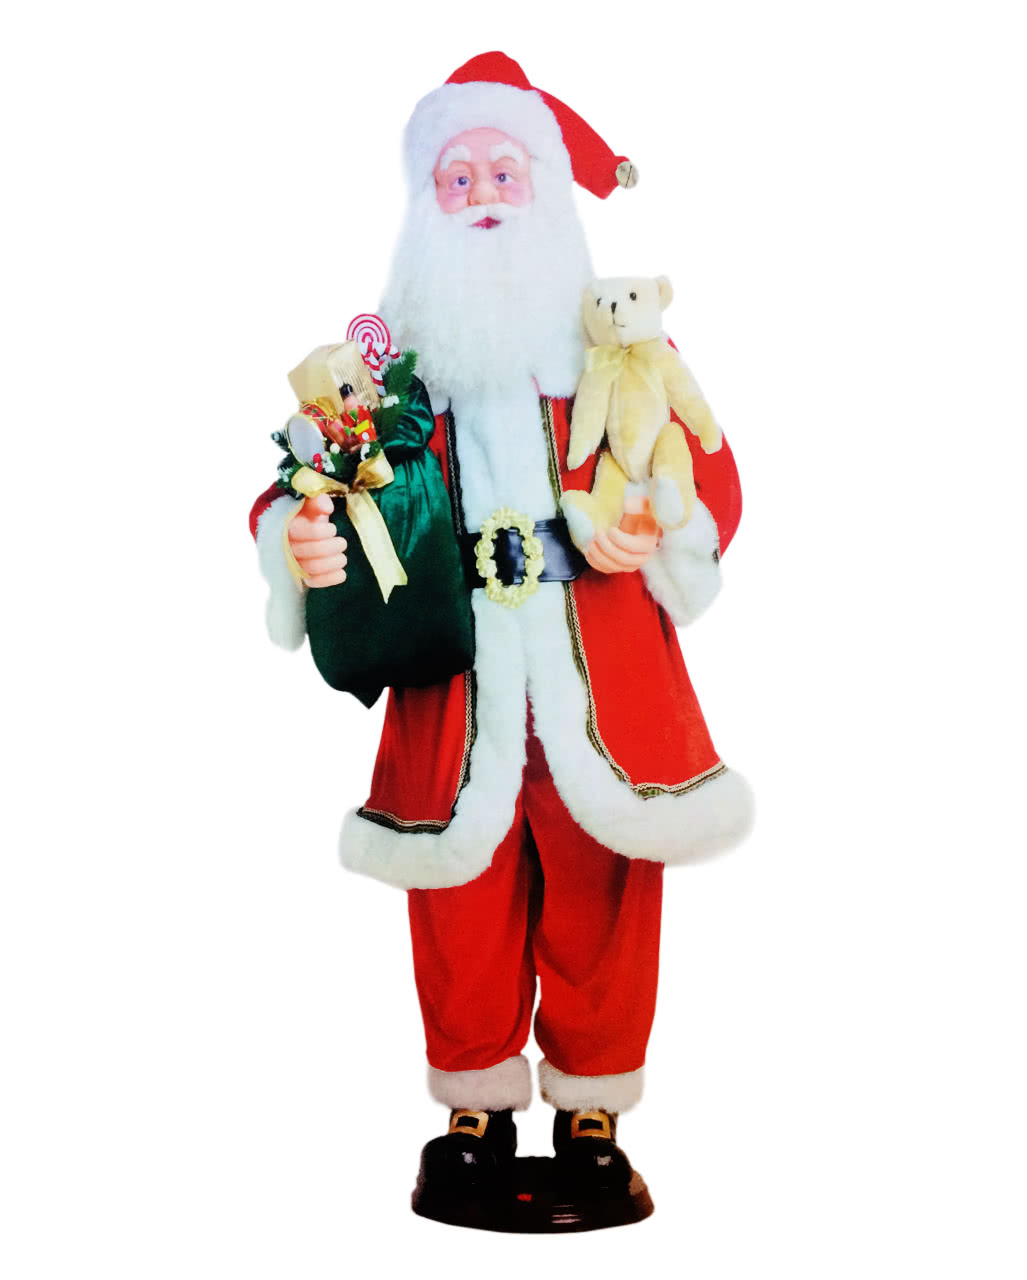 santa claus figure animatronic 150cm - Animatronic Christmas Decorations